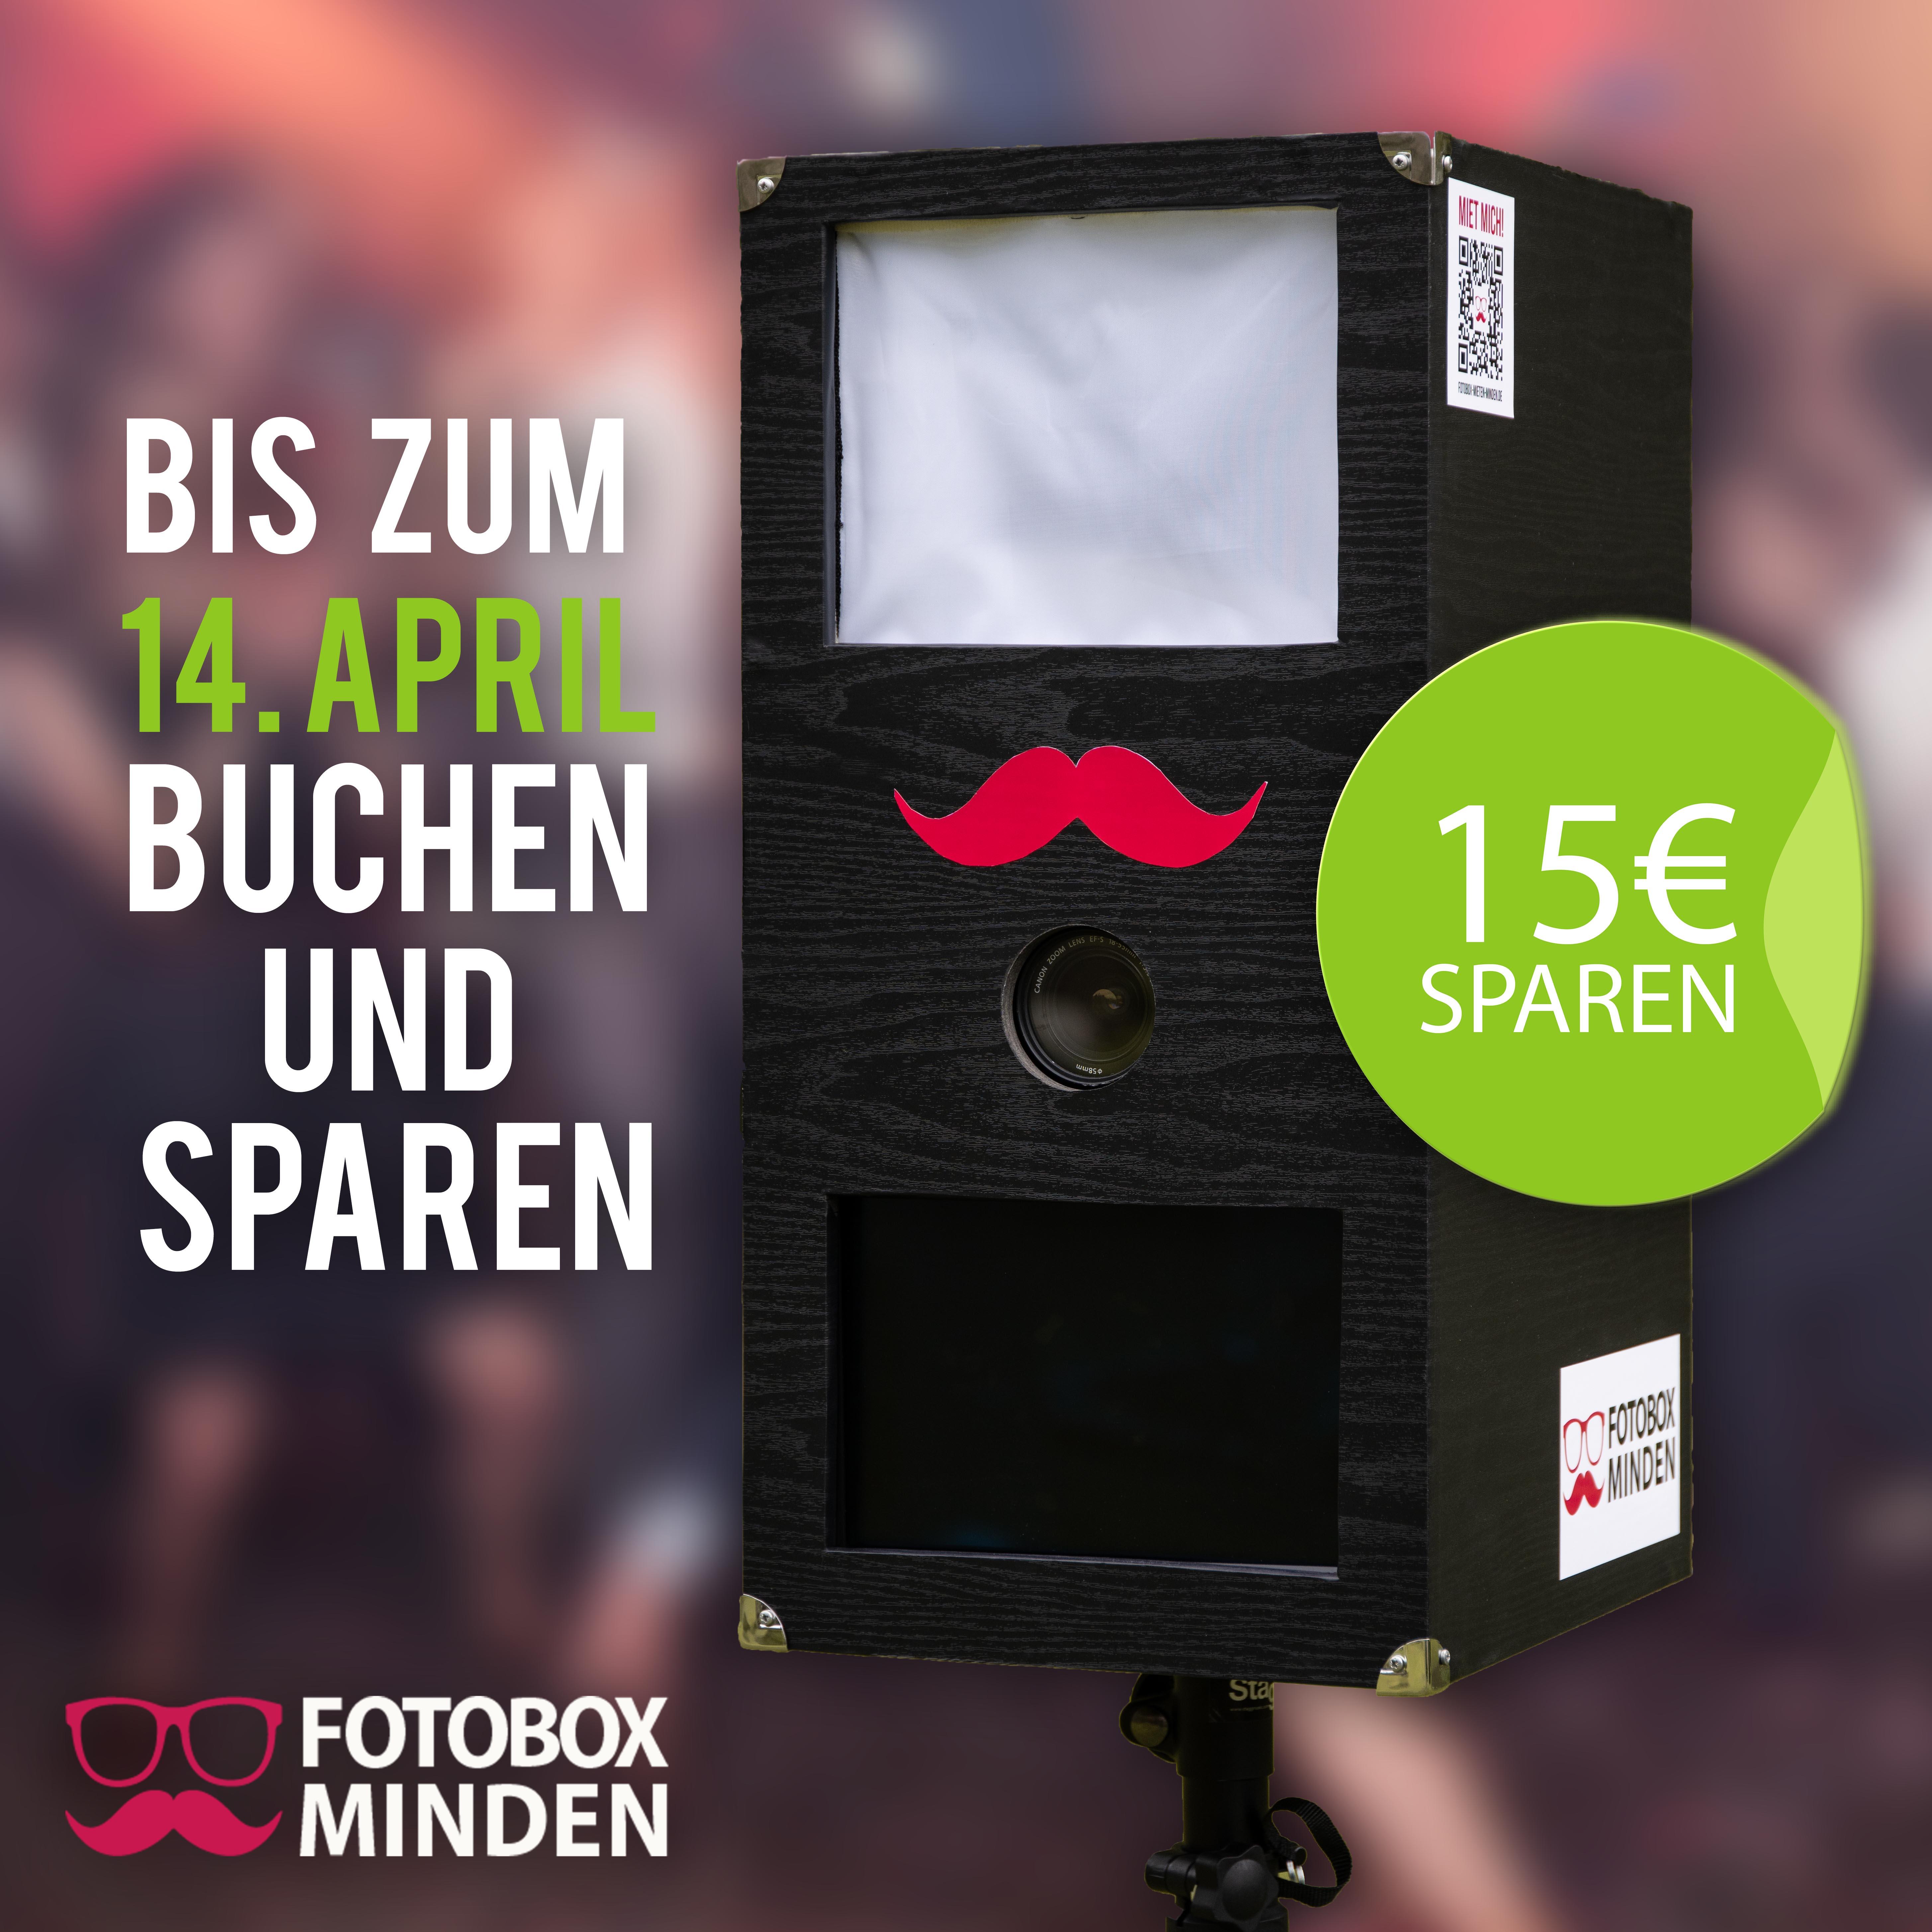 fotobox minden